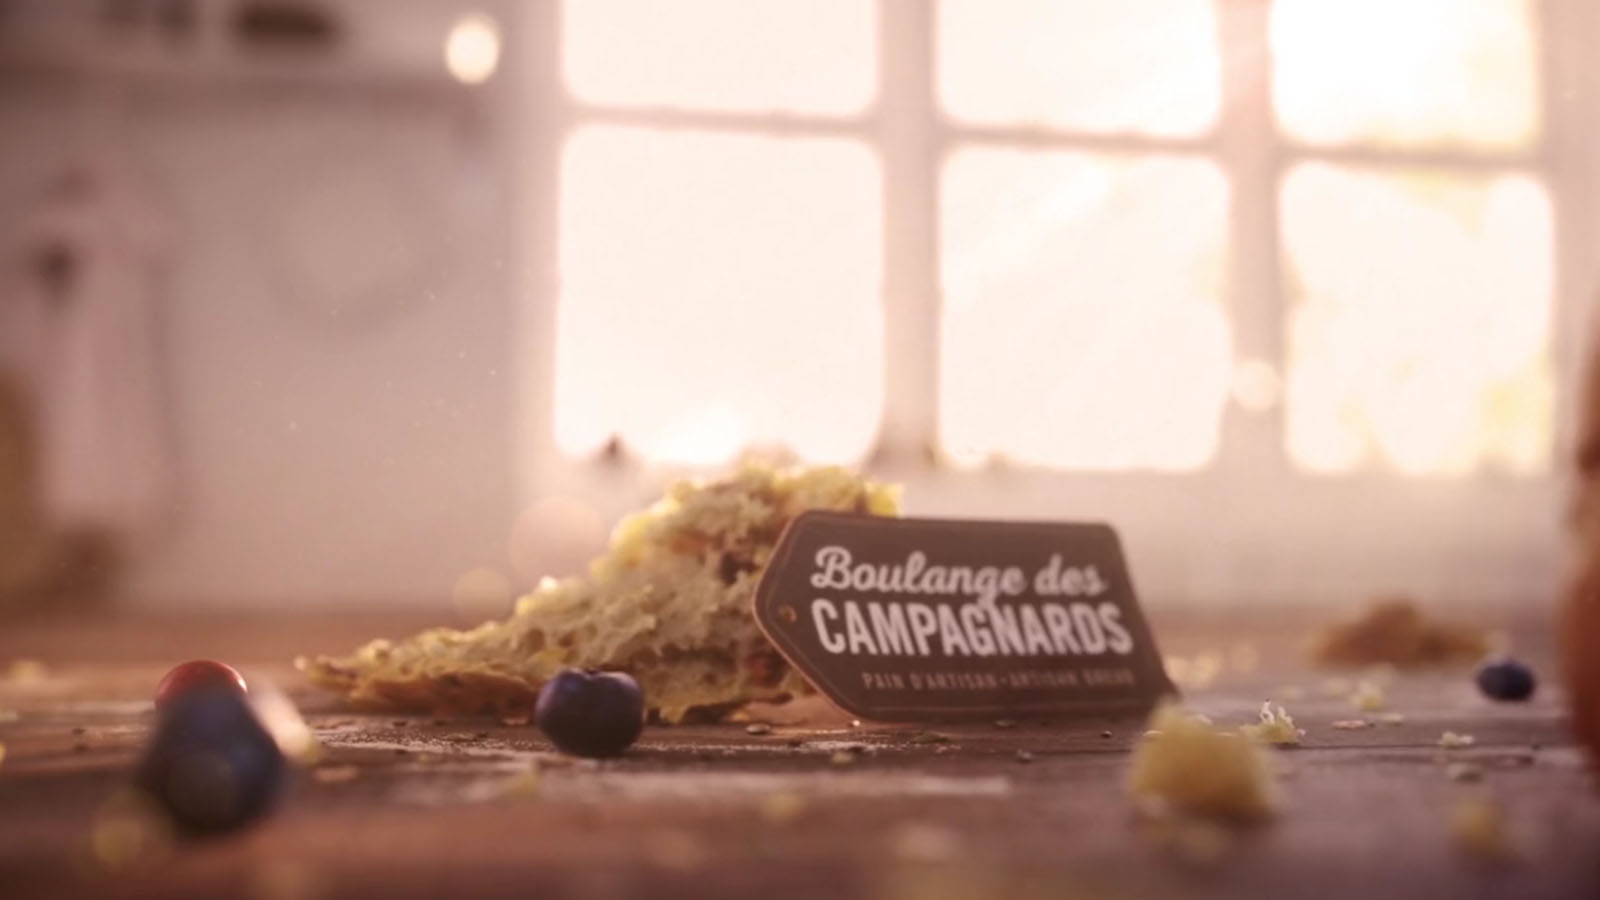 Canada Bread   Boulange Des Campagnards   Advertising